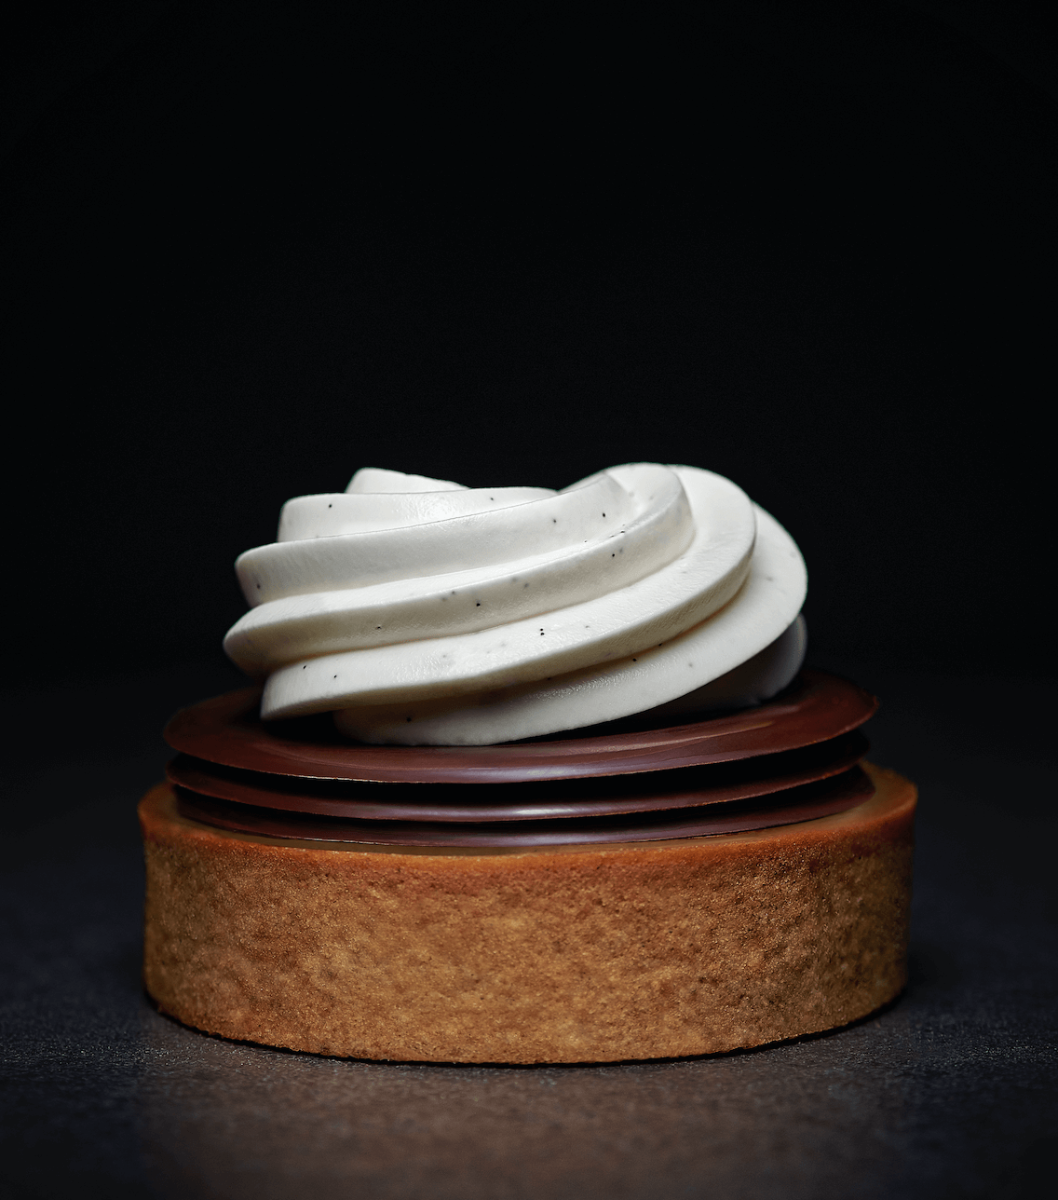 Norohy Layered Chocolate Tarts Recipe